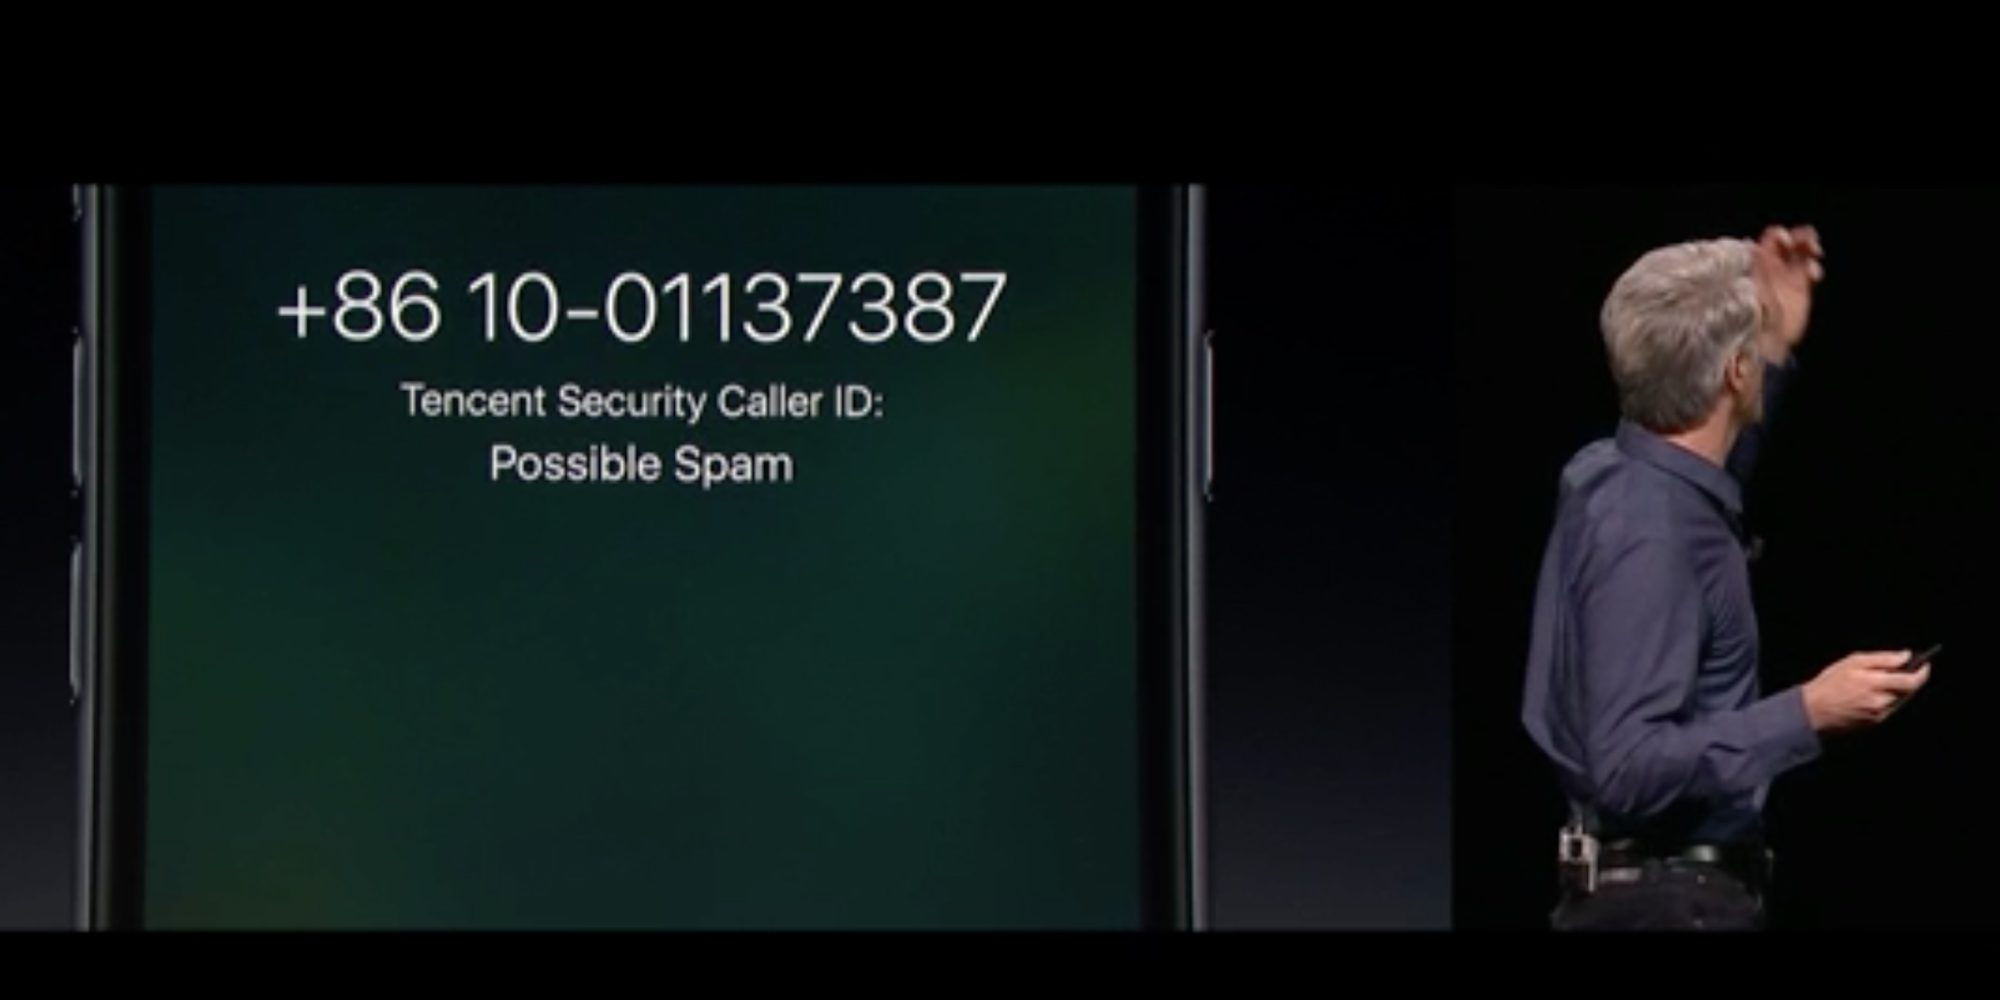 spam telefonico robocall ios 10 craig federighi